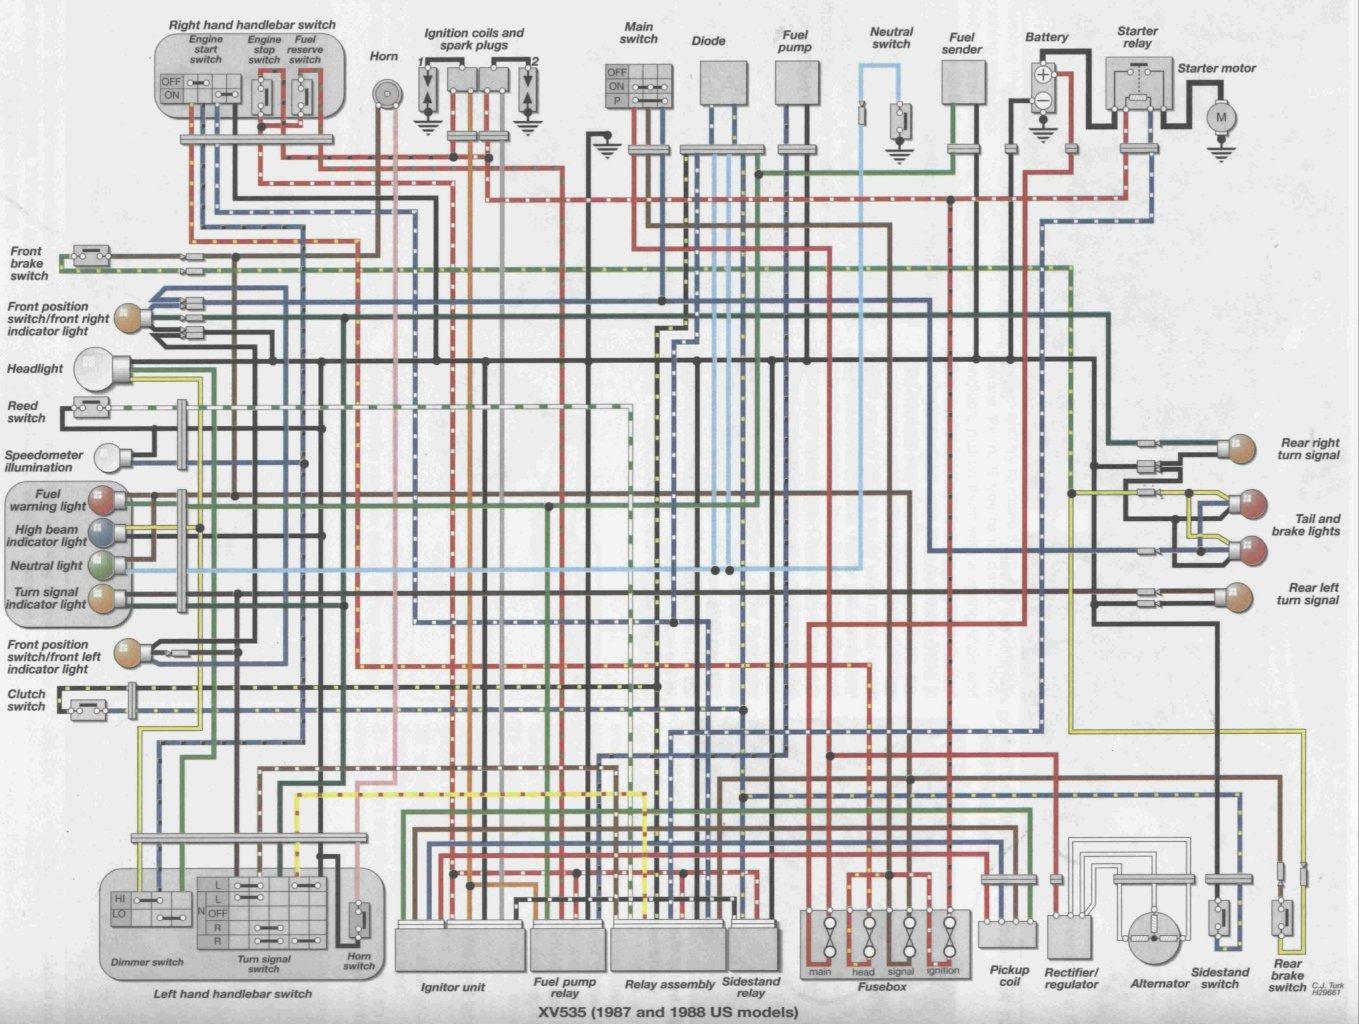 hight resolution of 1984 honda vt500c wiring diagram color wiring diagrams data base rh alfrescosolutions co 1984 honda shadow